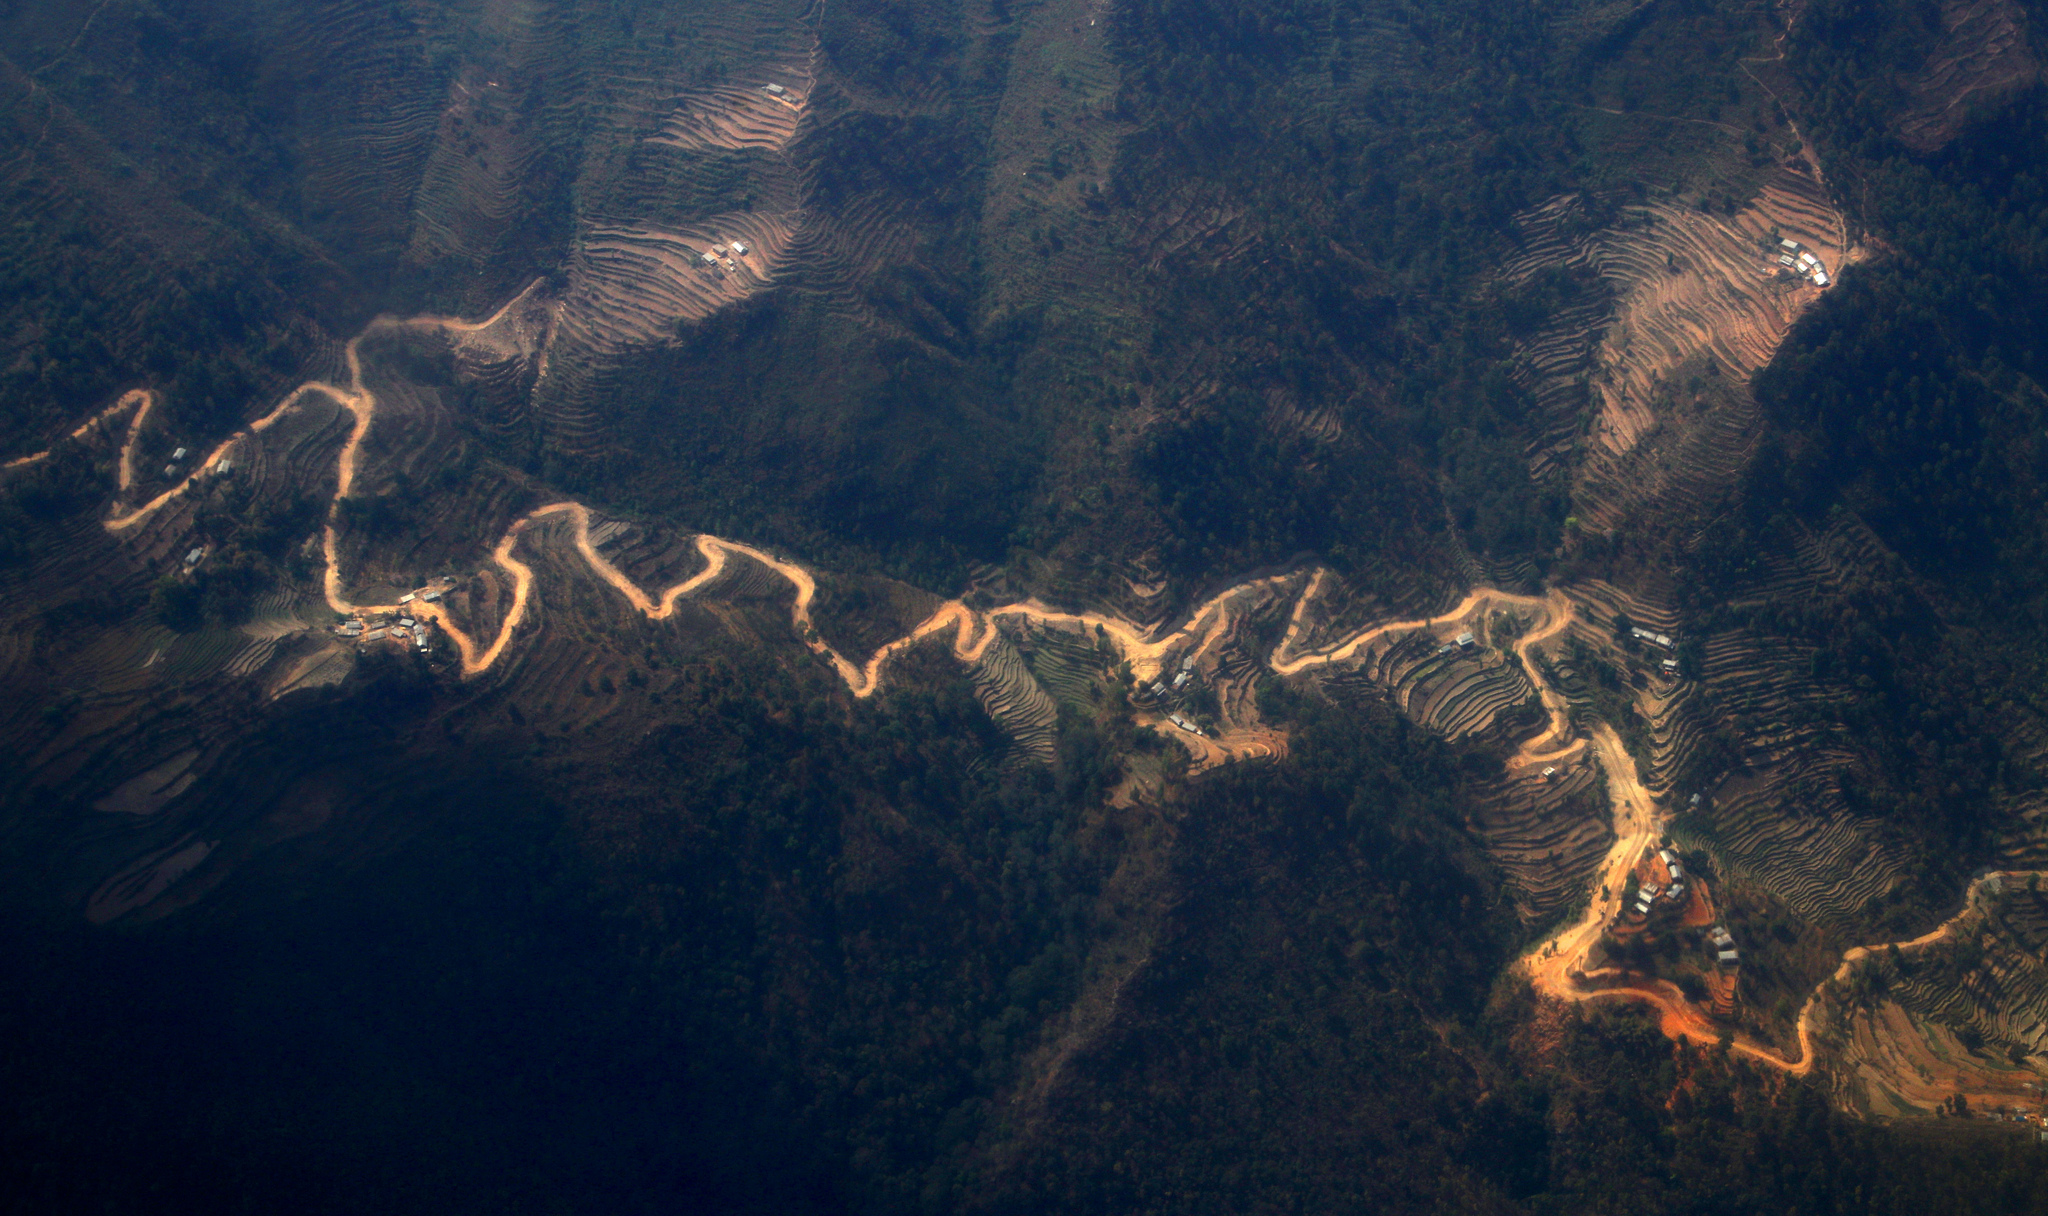 Trekking the Solukhumbu Cultural Trail